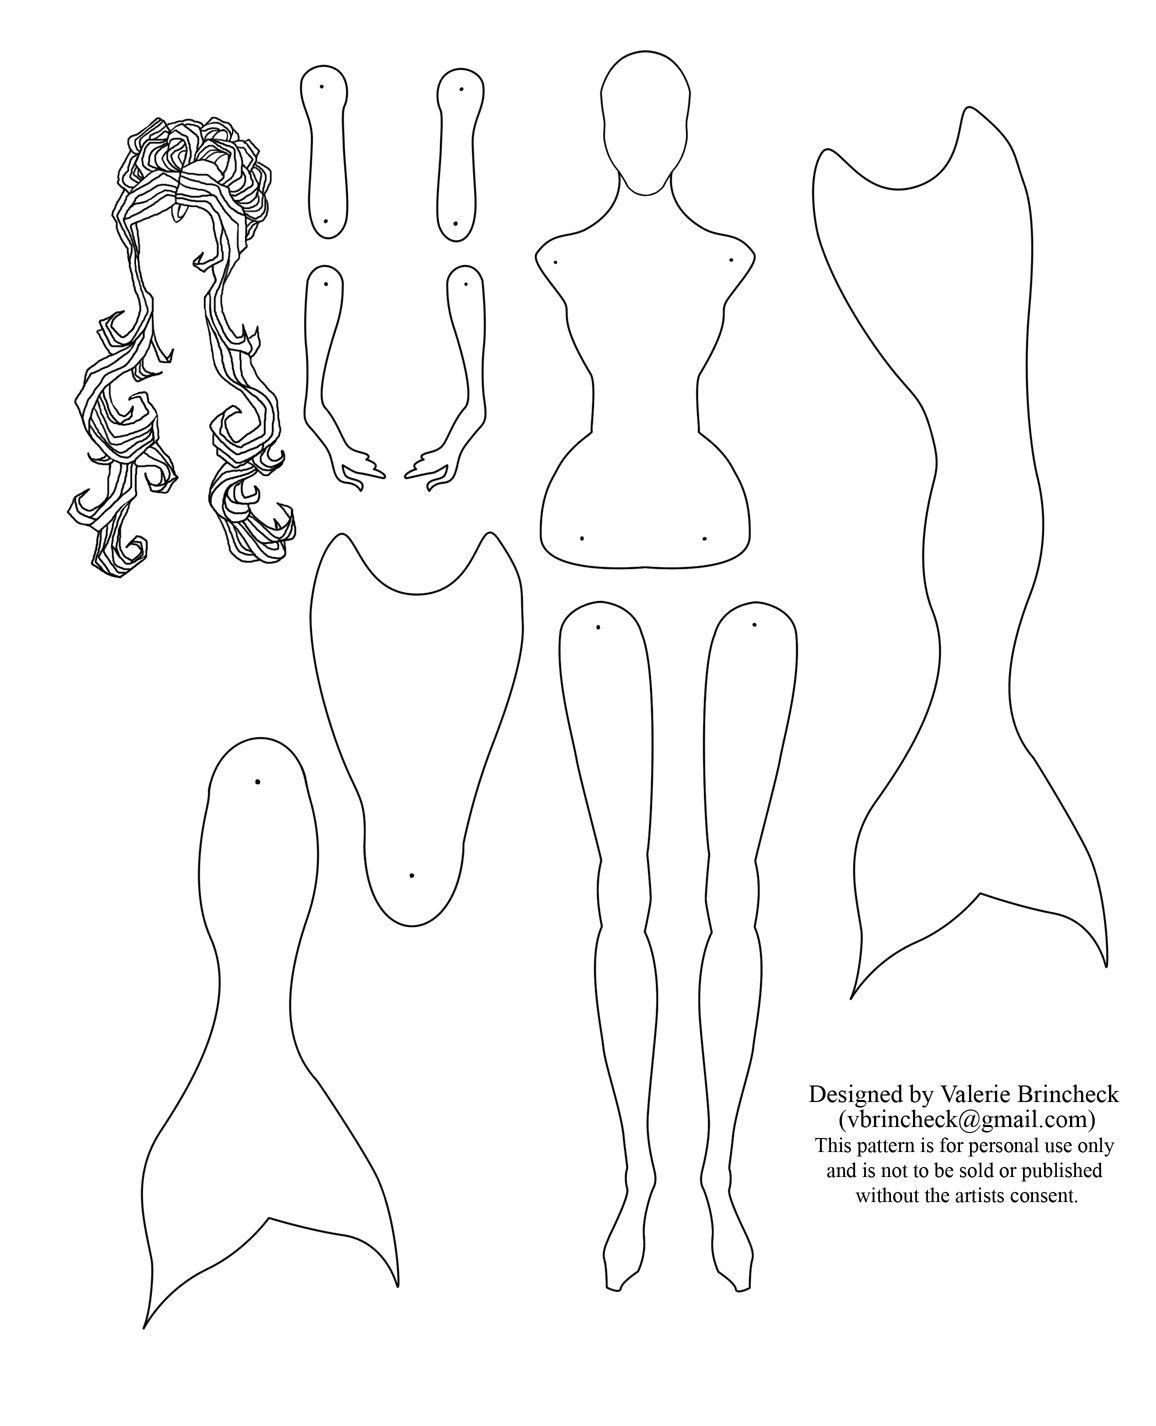 Mermaid paper doll by Valerie Brincheck